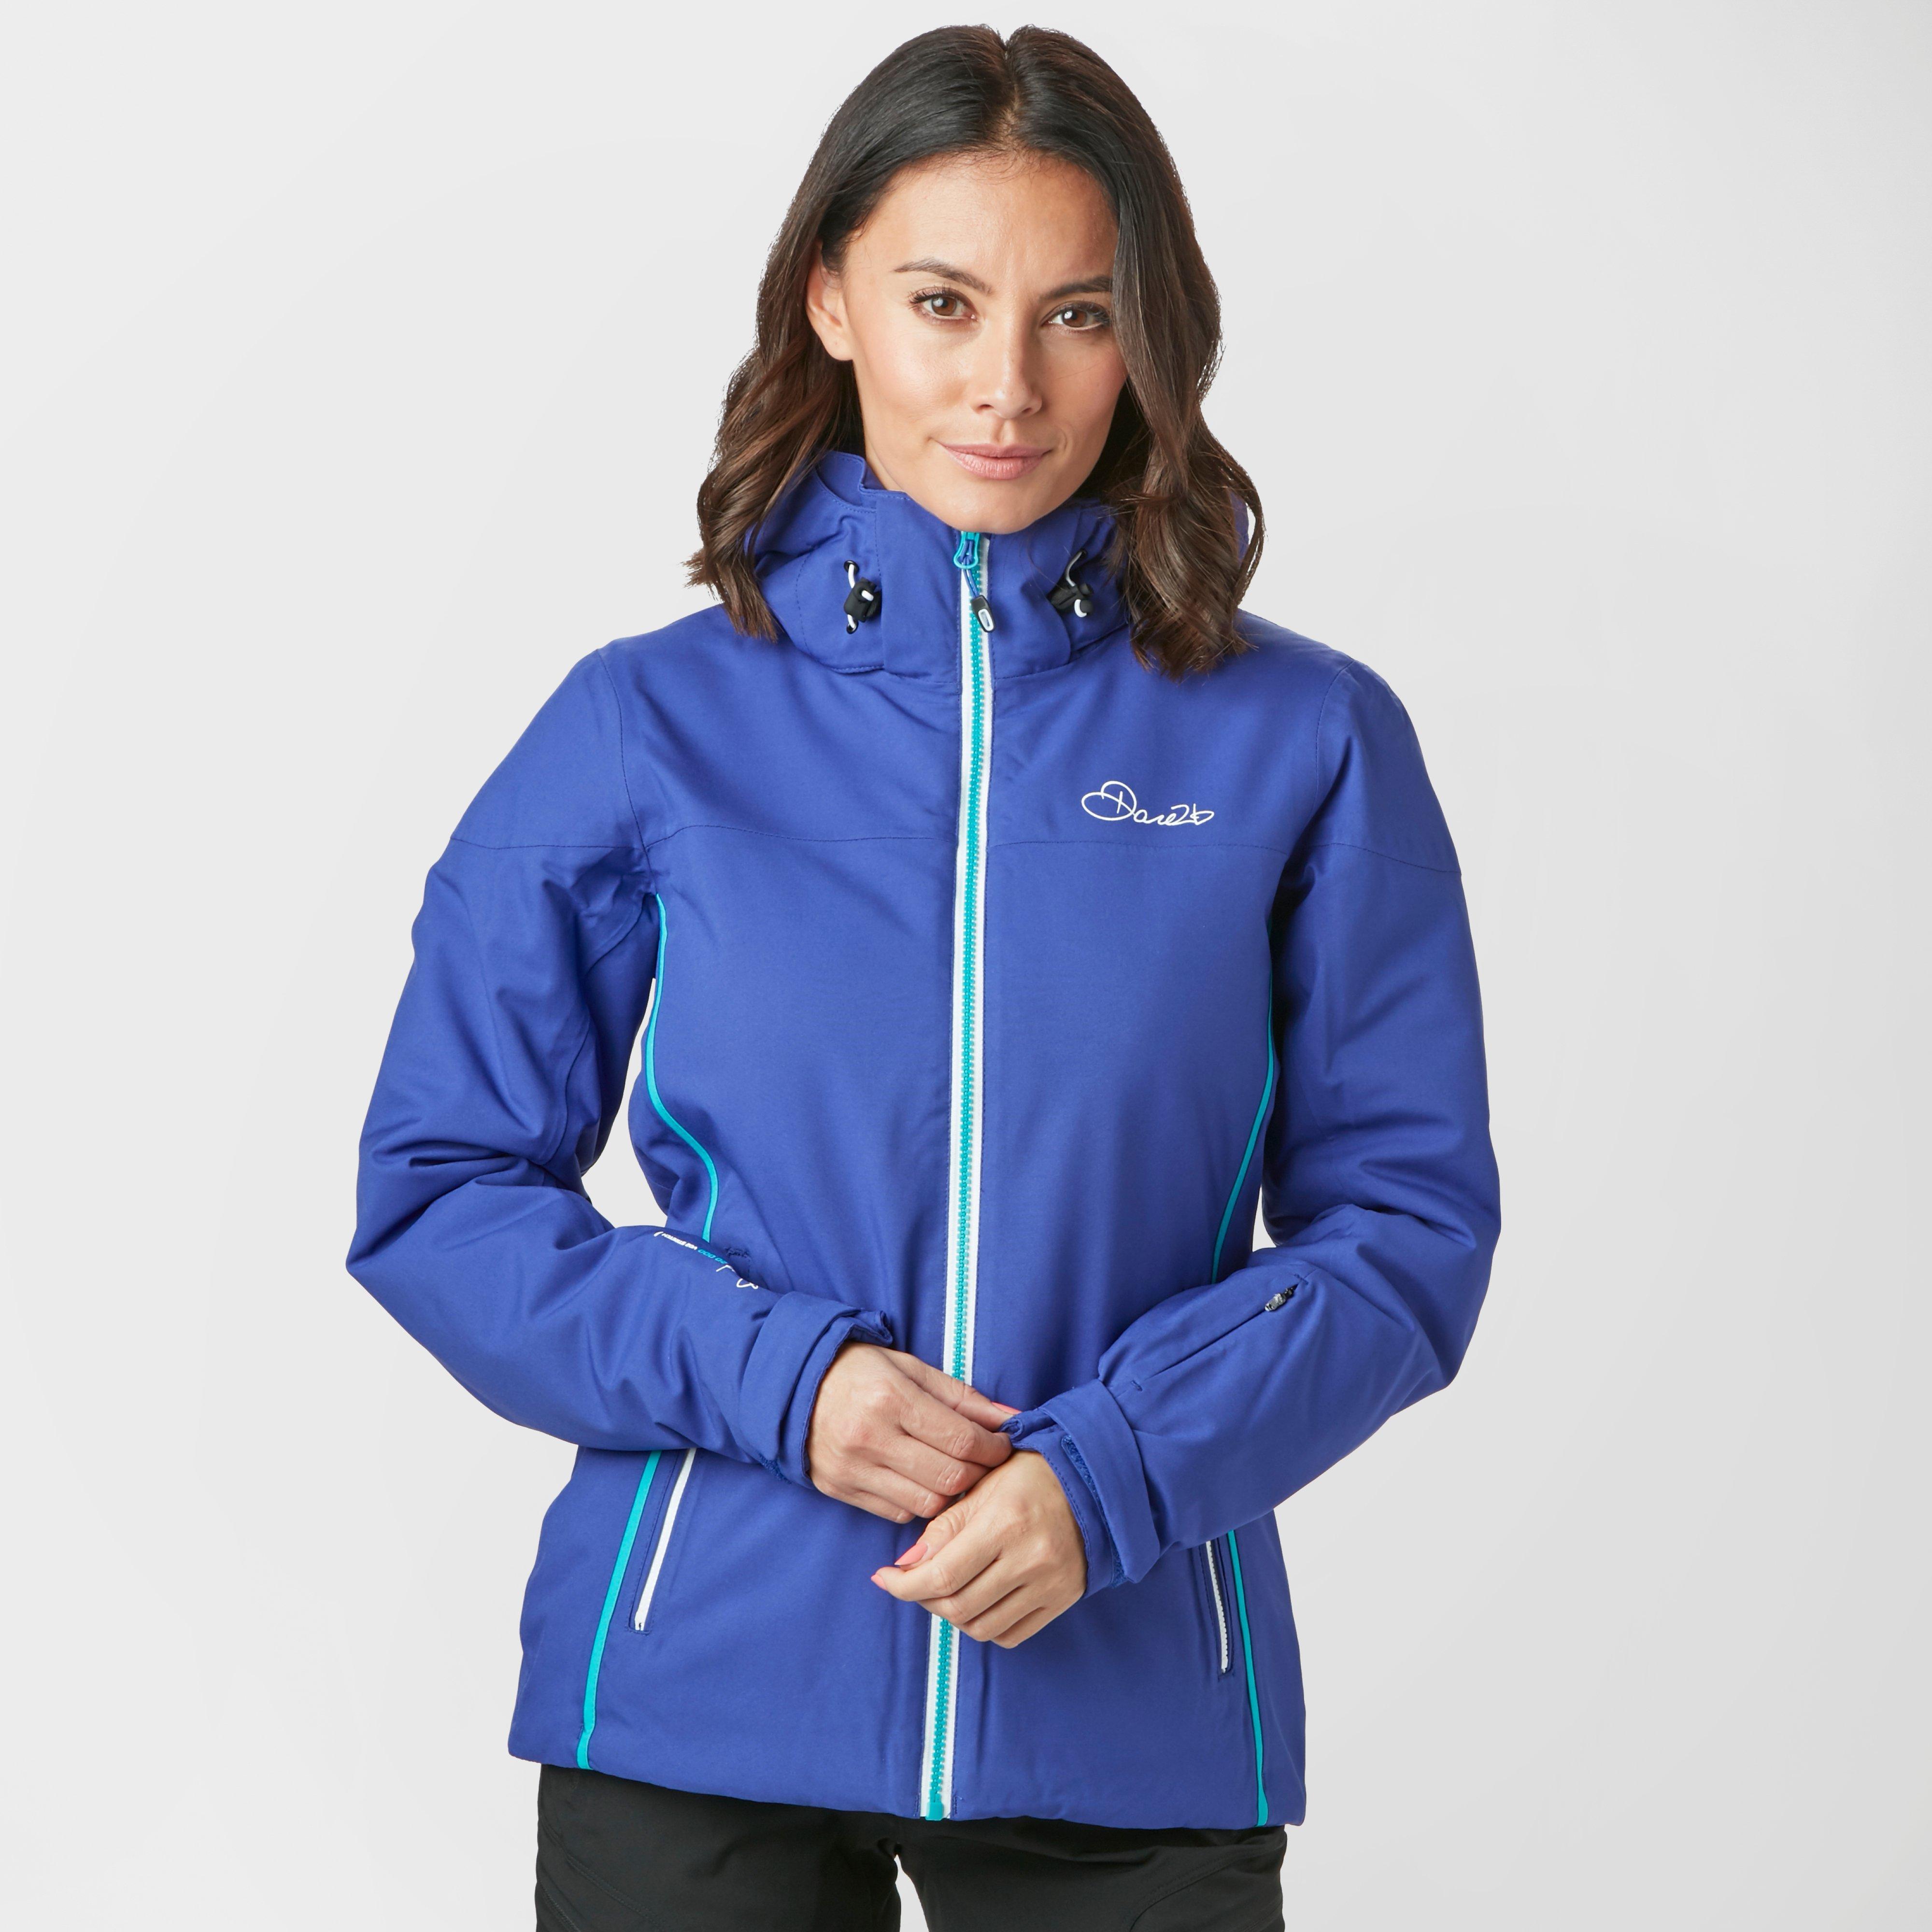 5941cad2b8 Dare 2B Women s Invoke II Ski Jacket